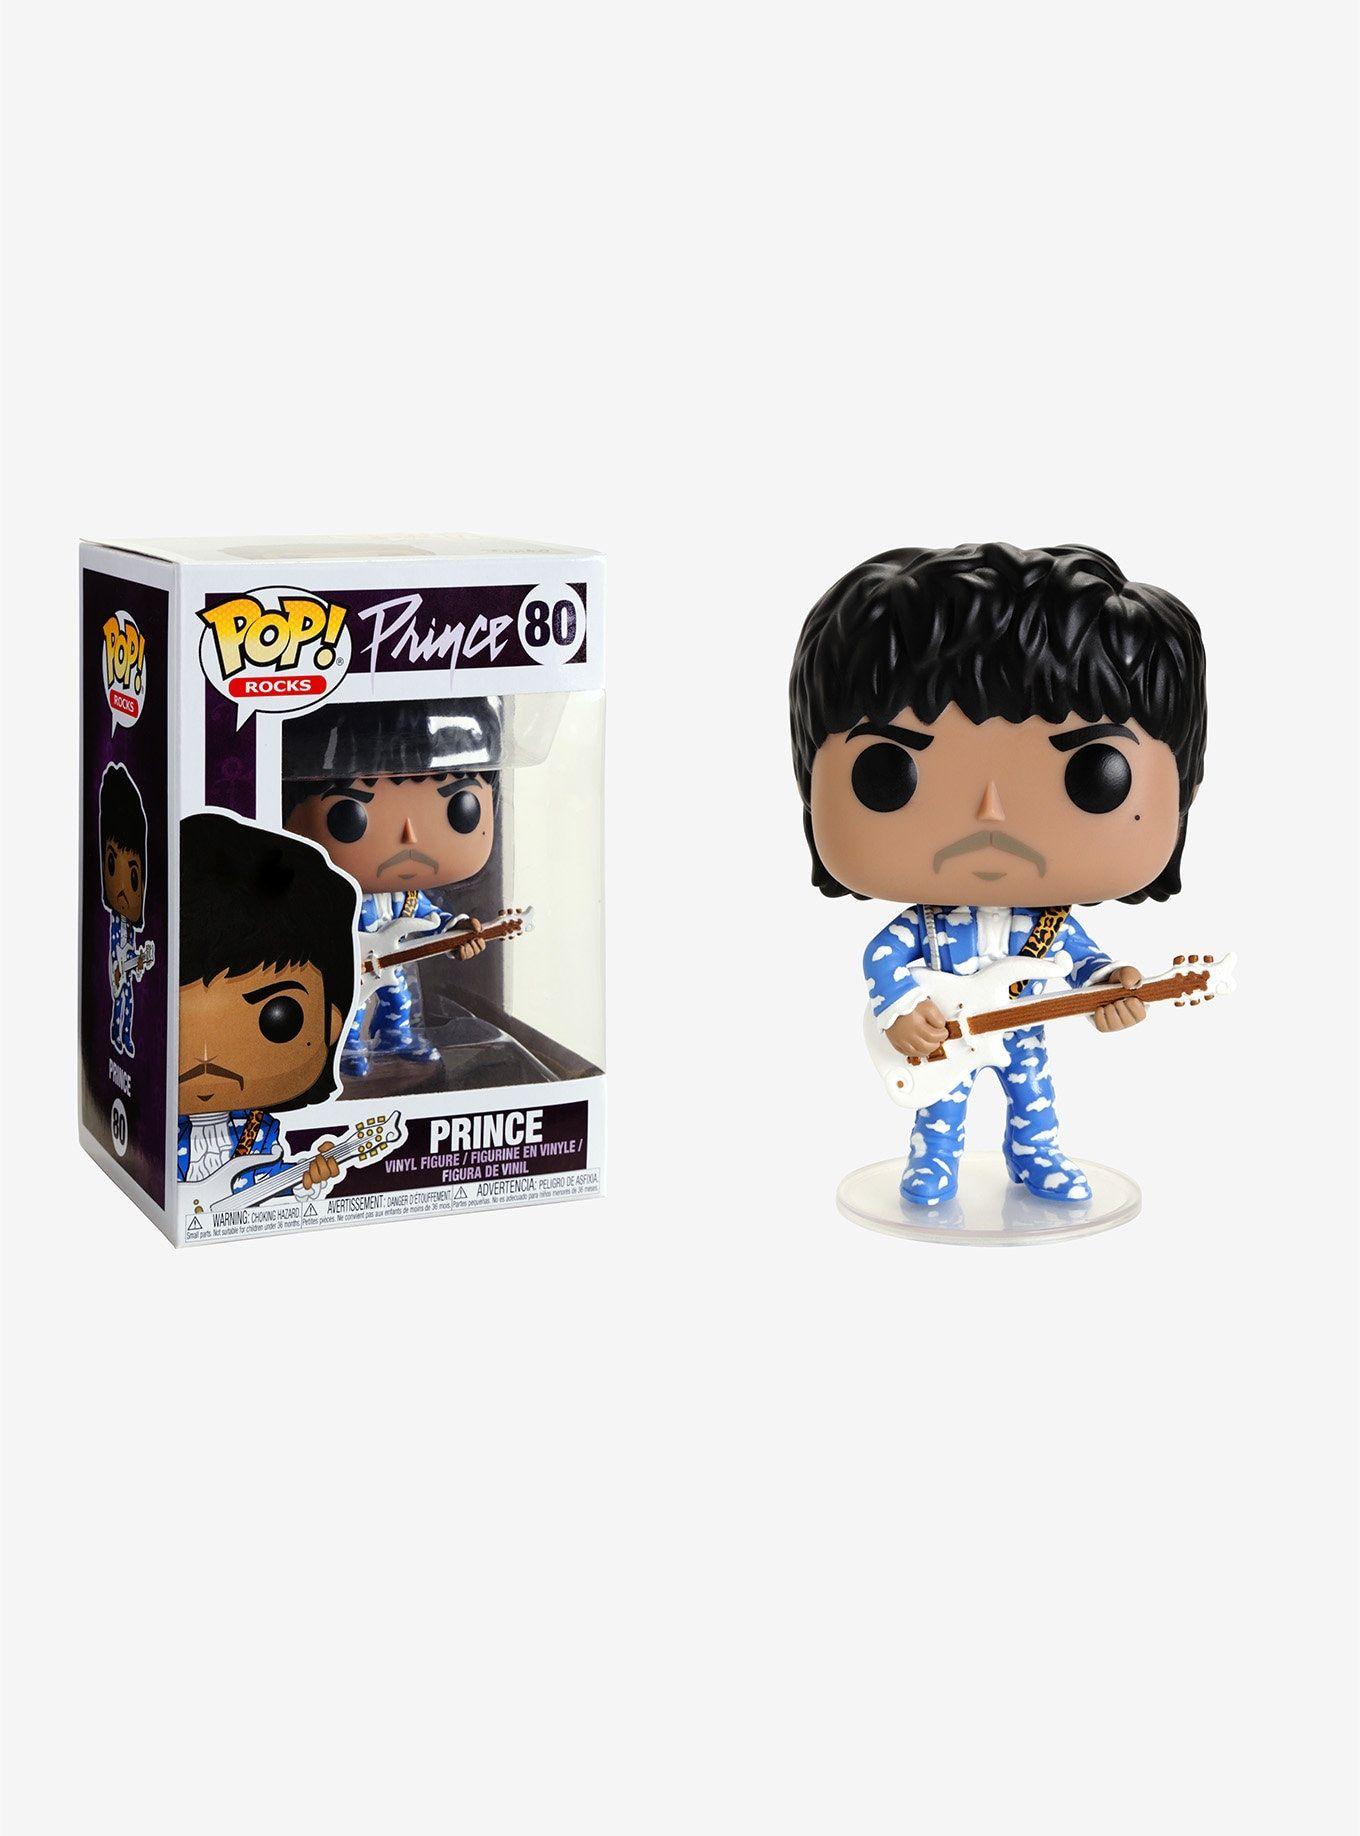 Rocks Prince-Around the World in a day 80 32248 Vinyl Figure FUNKO POP